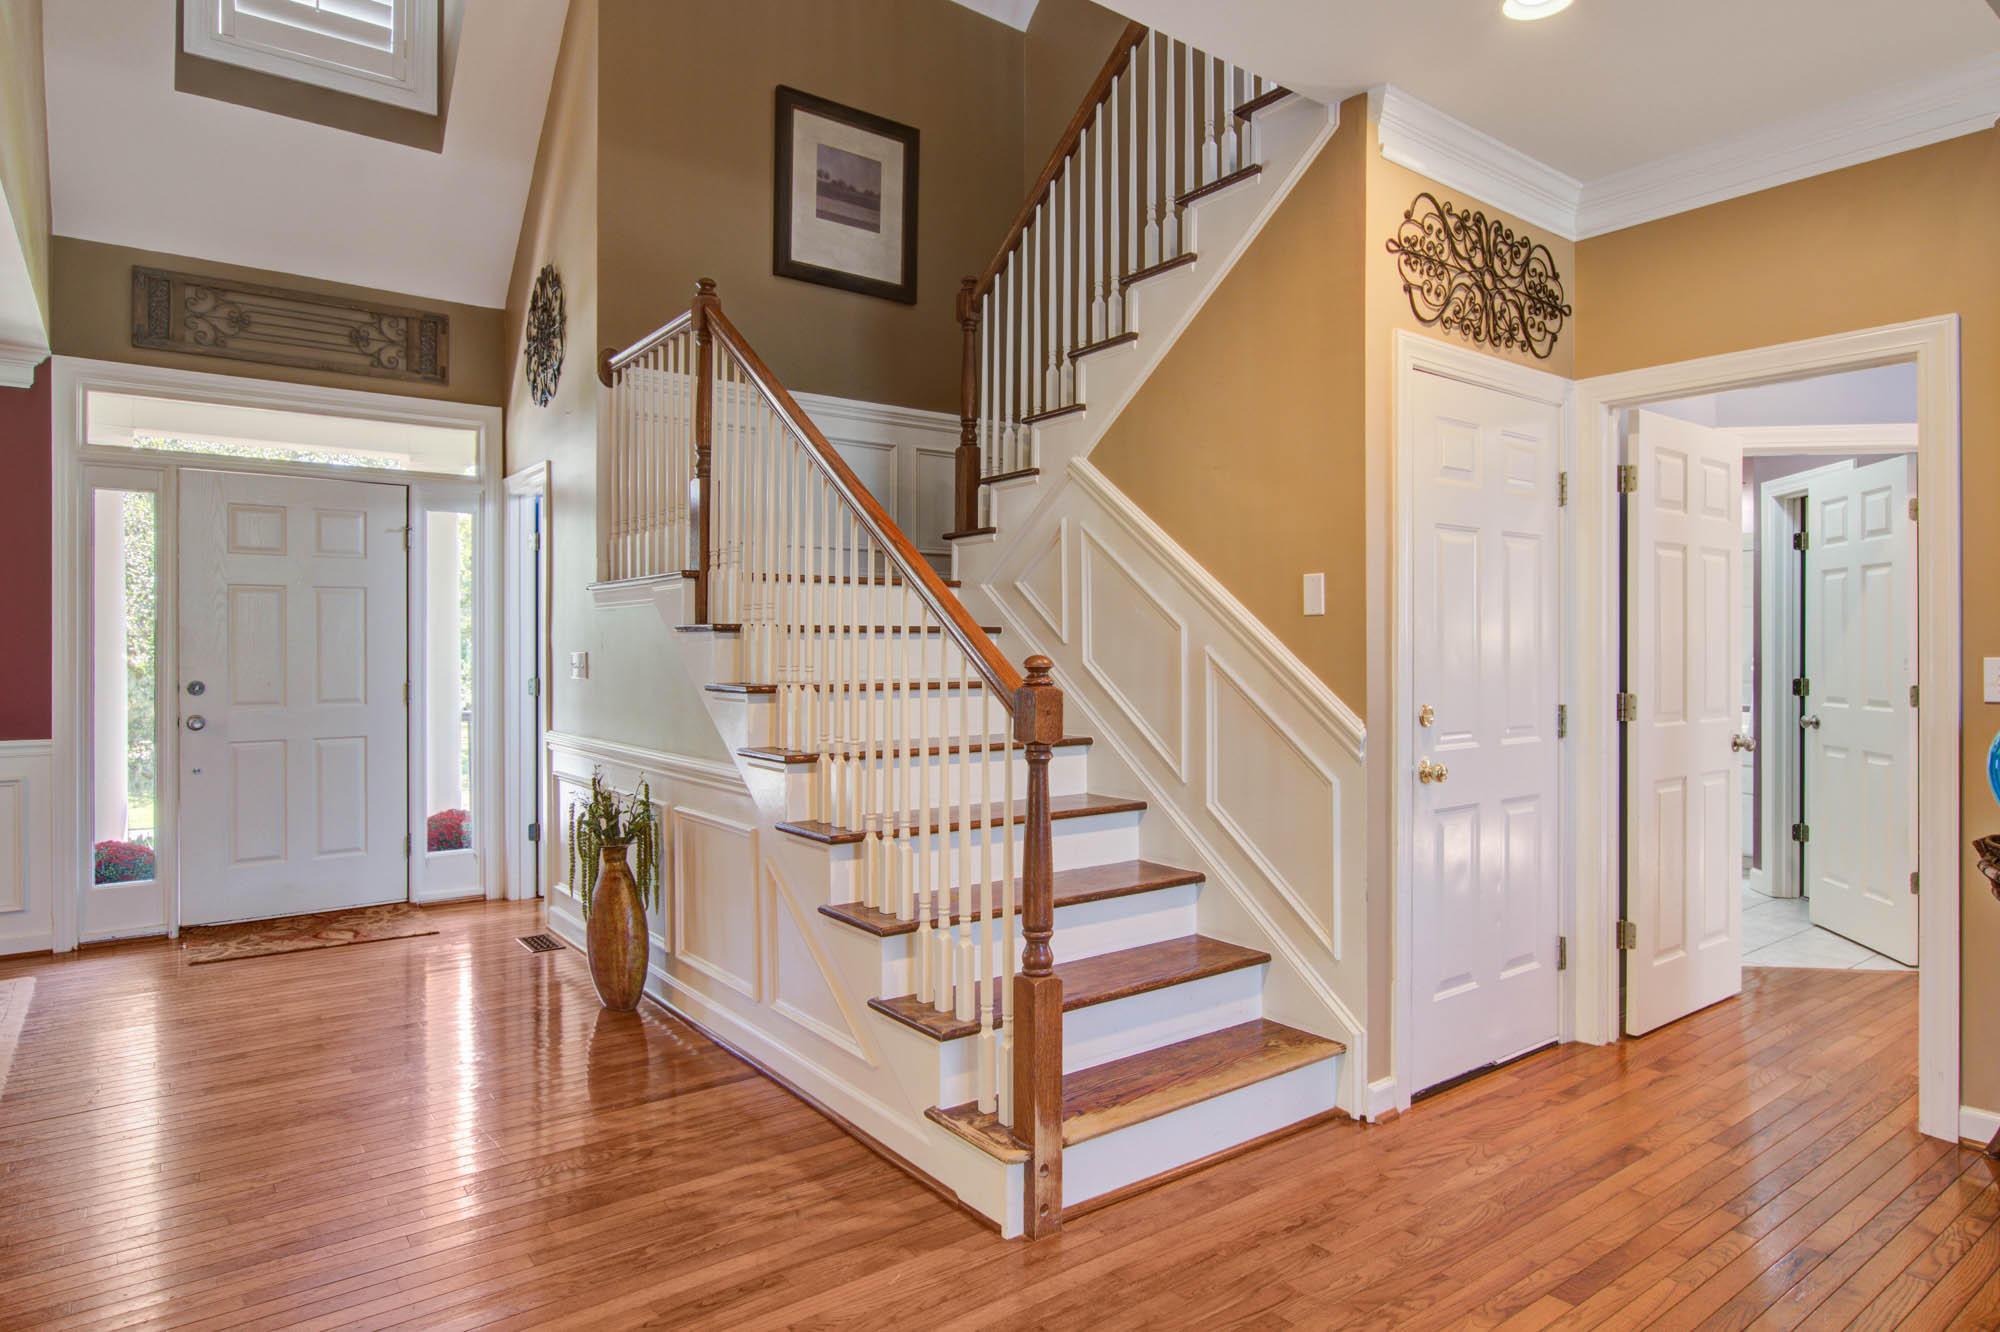 St Thomas Point Homes For Sale - 307 Jamesbury, Charleston, SC - 19